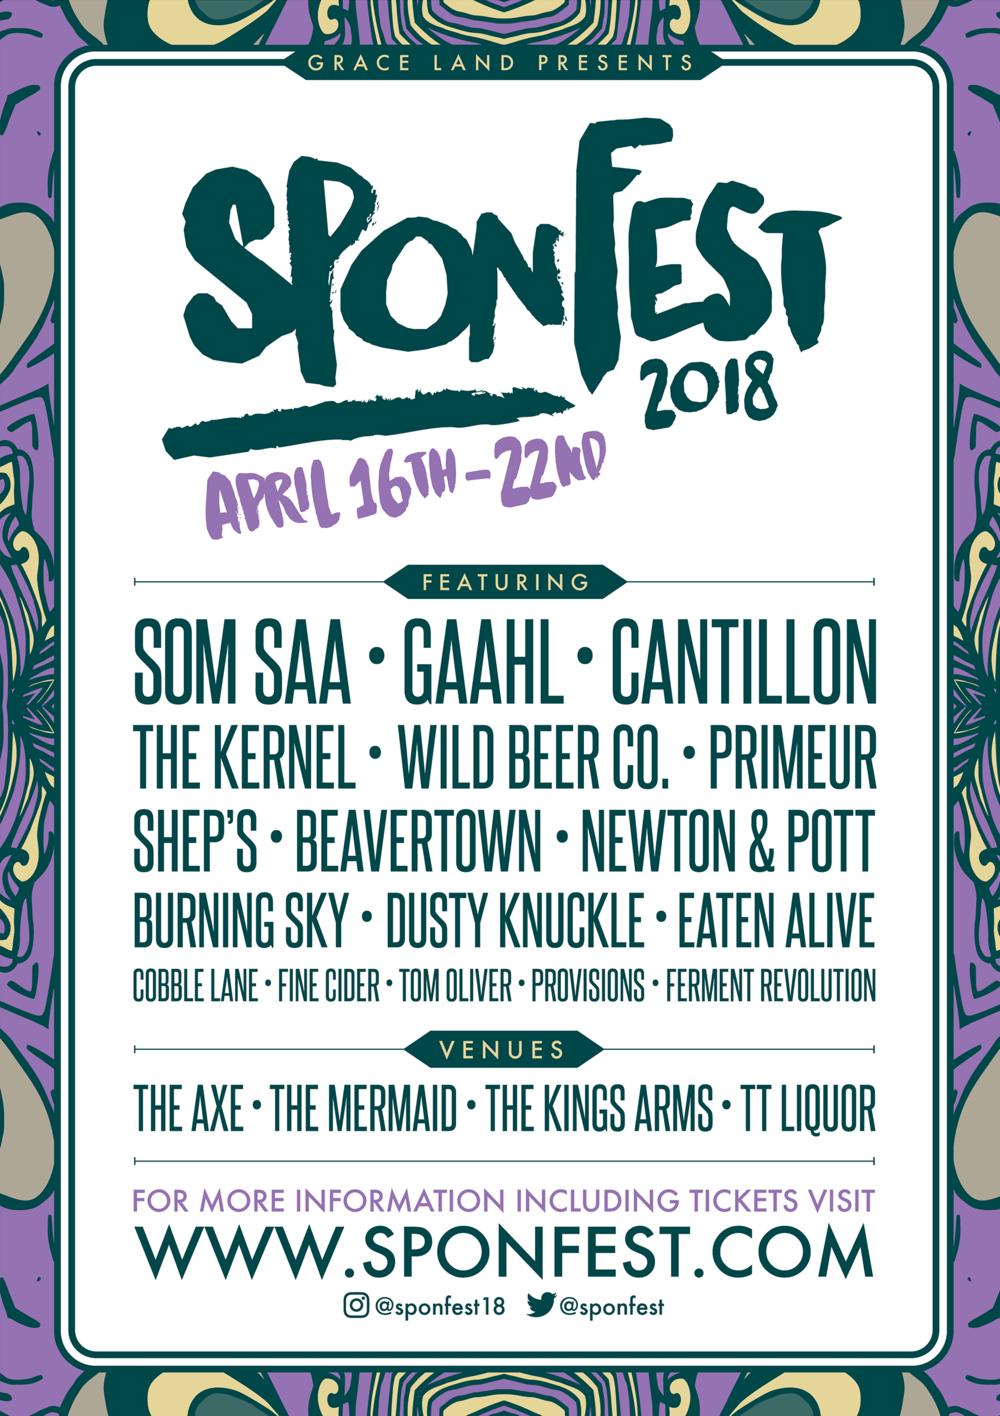 Sponfest_Final-1.png